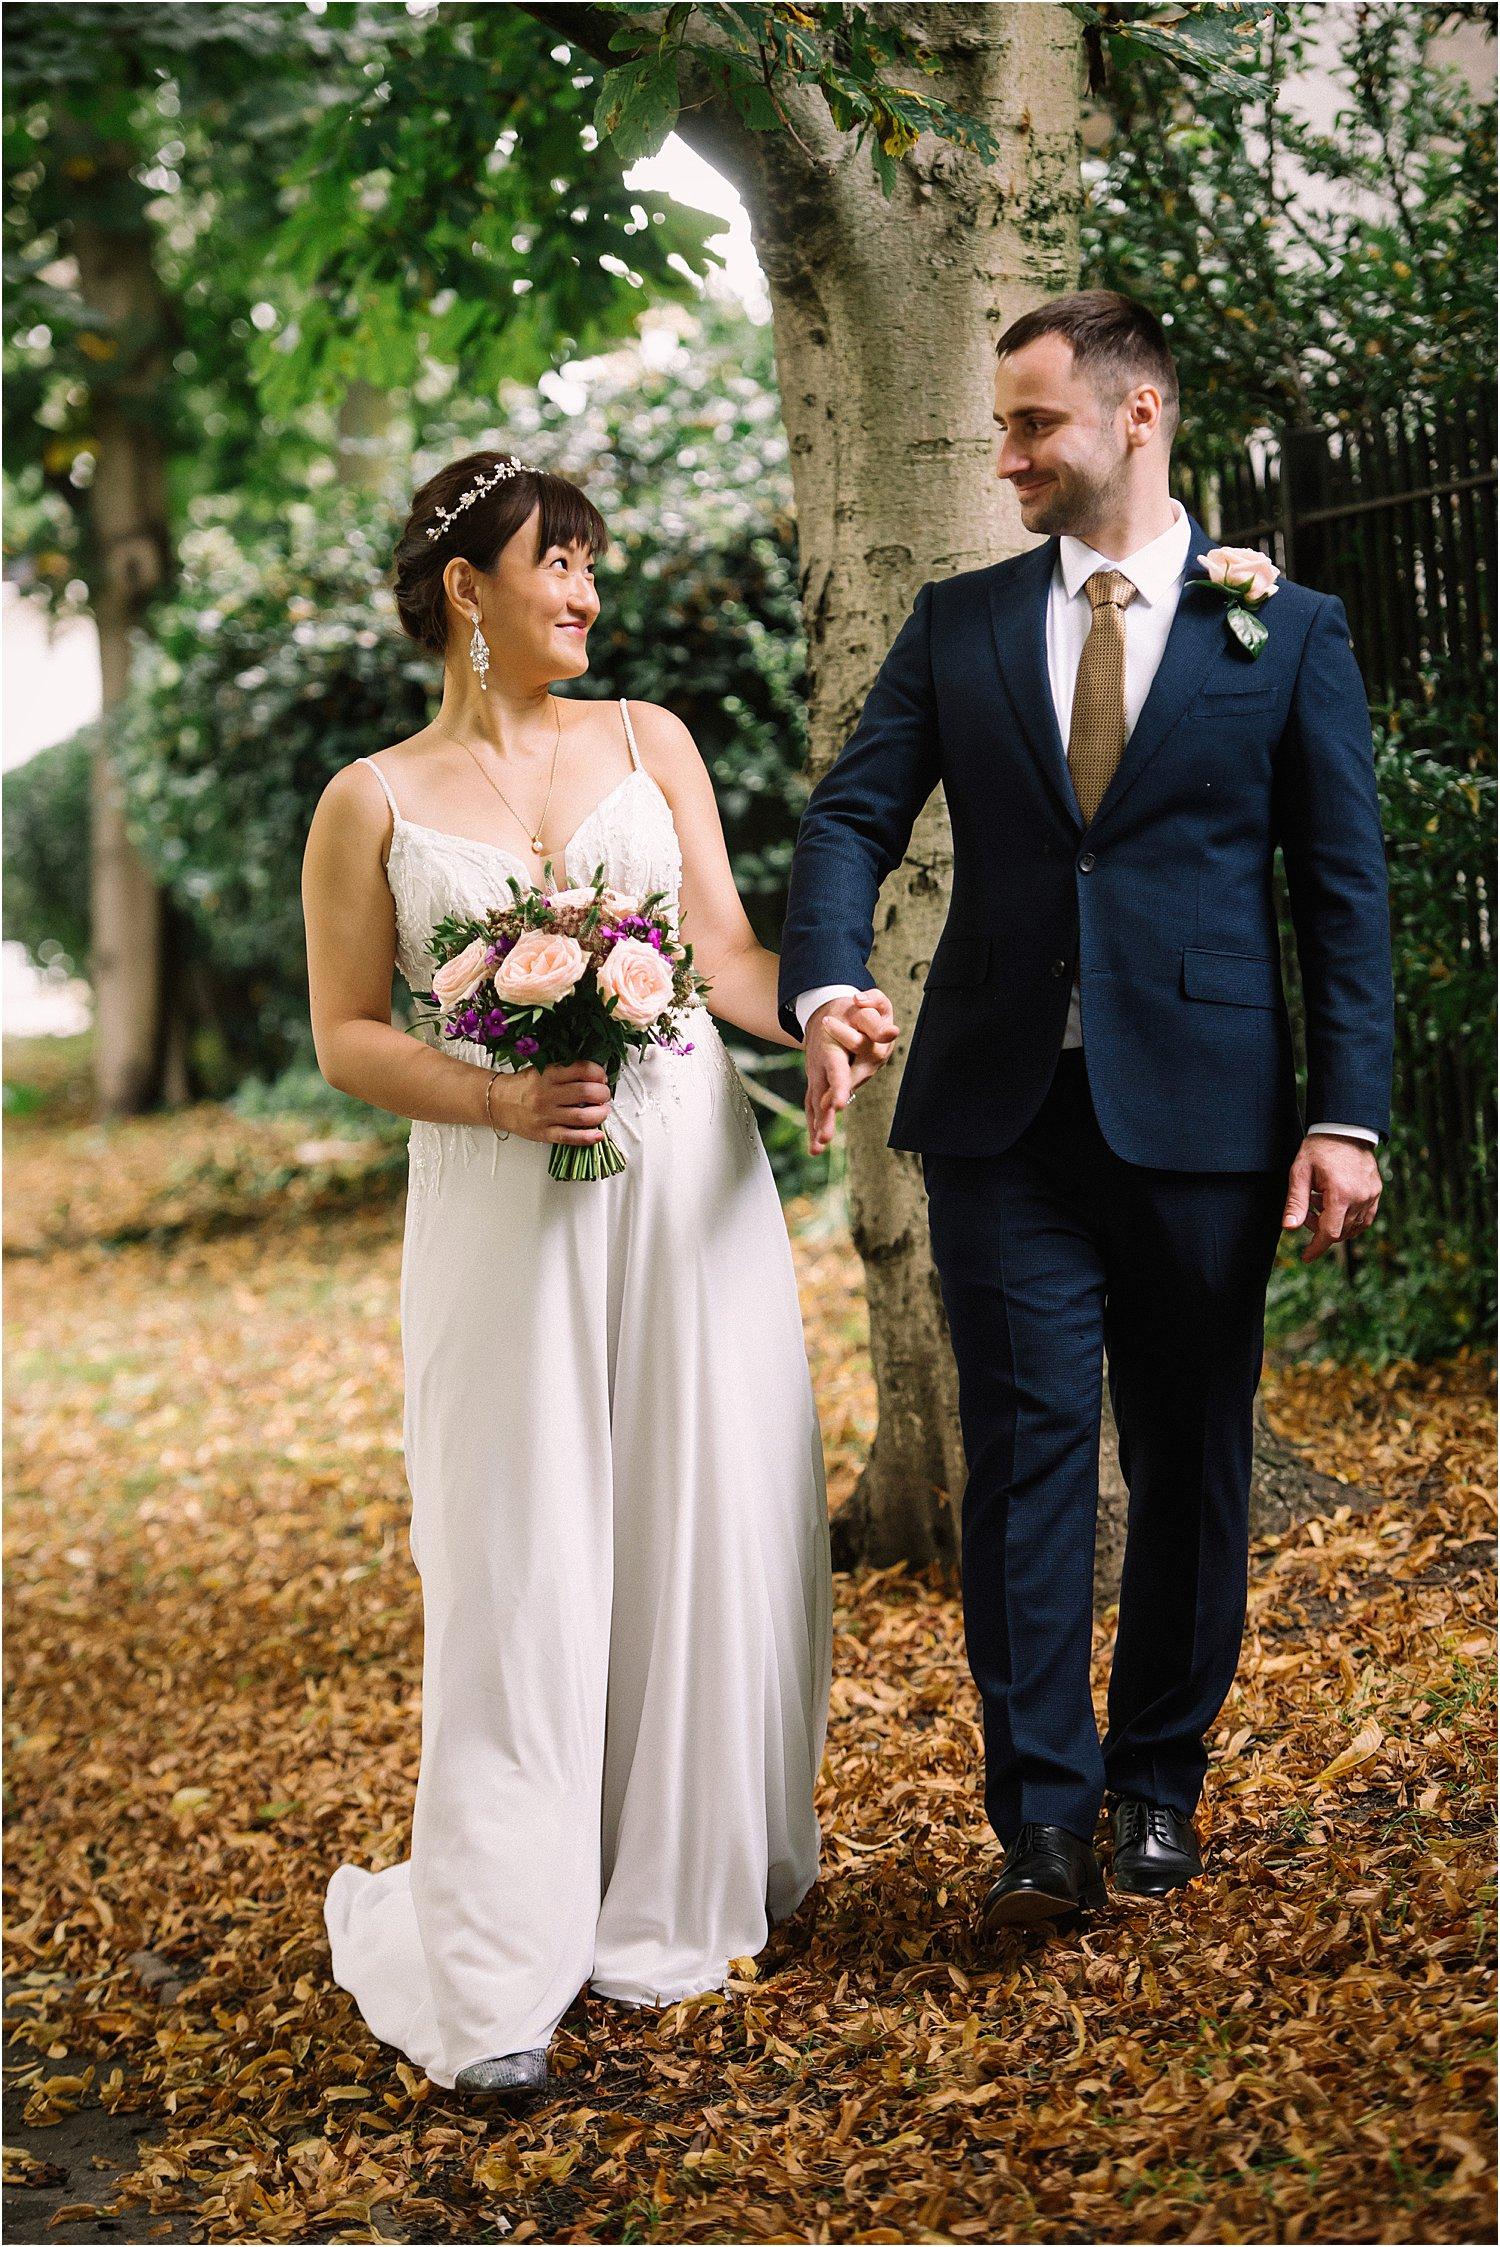 north-london-wedding-michelle-gio-sawyer-photography